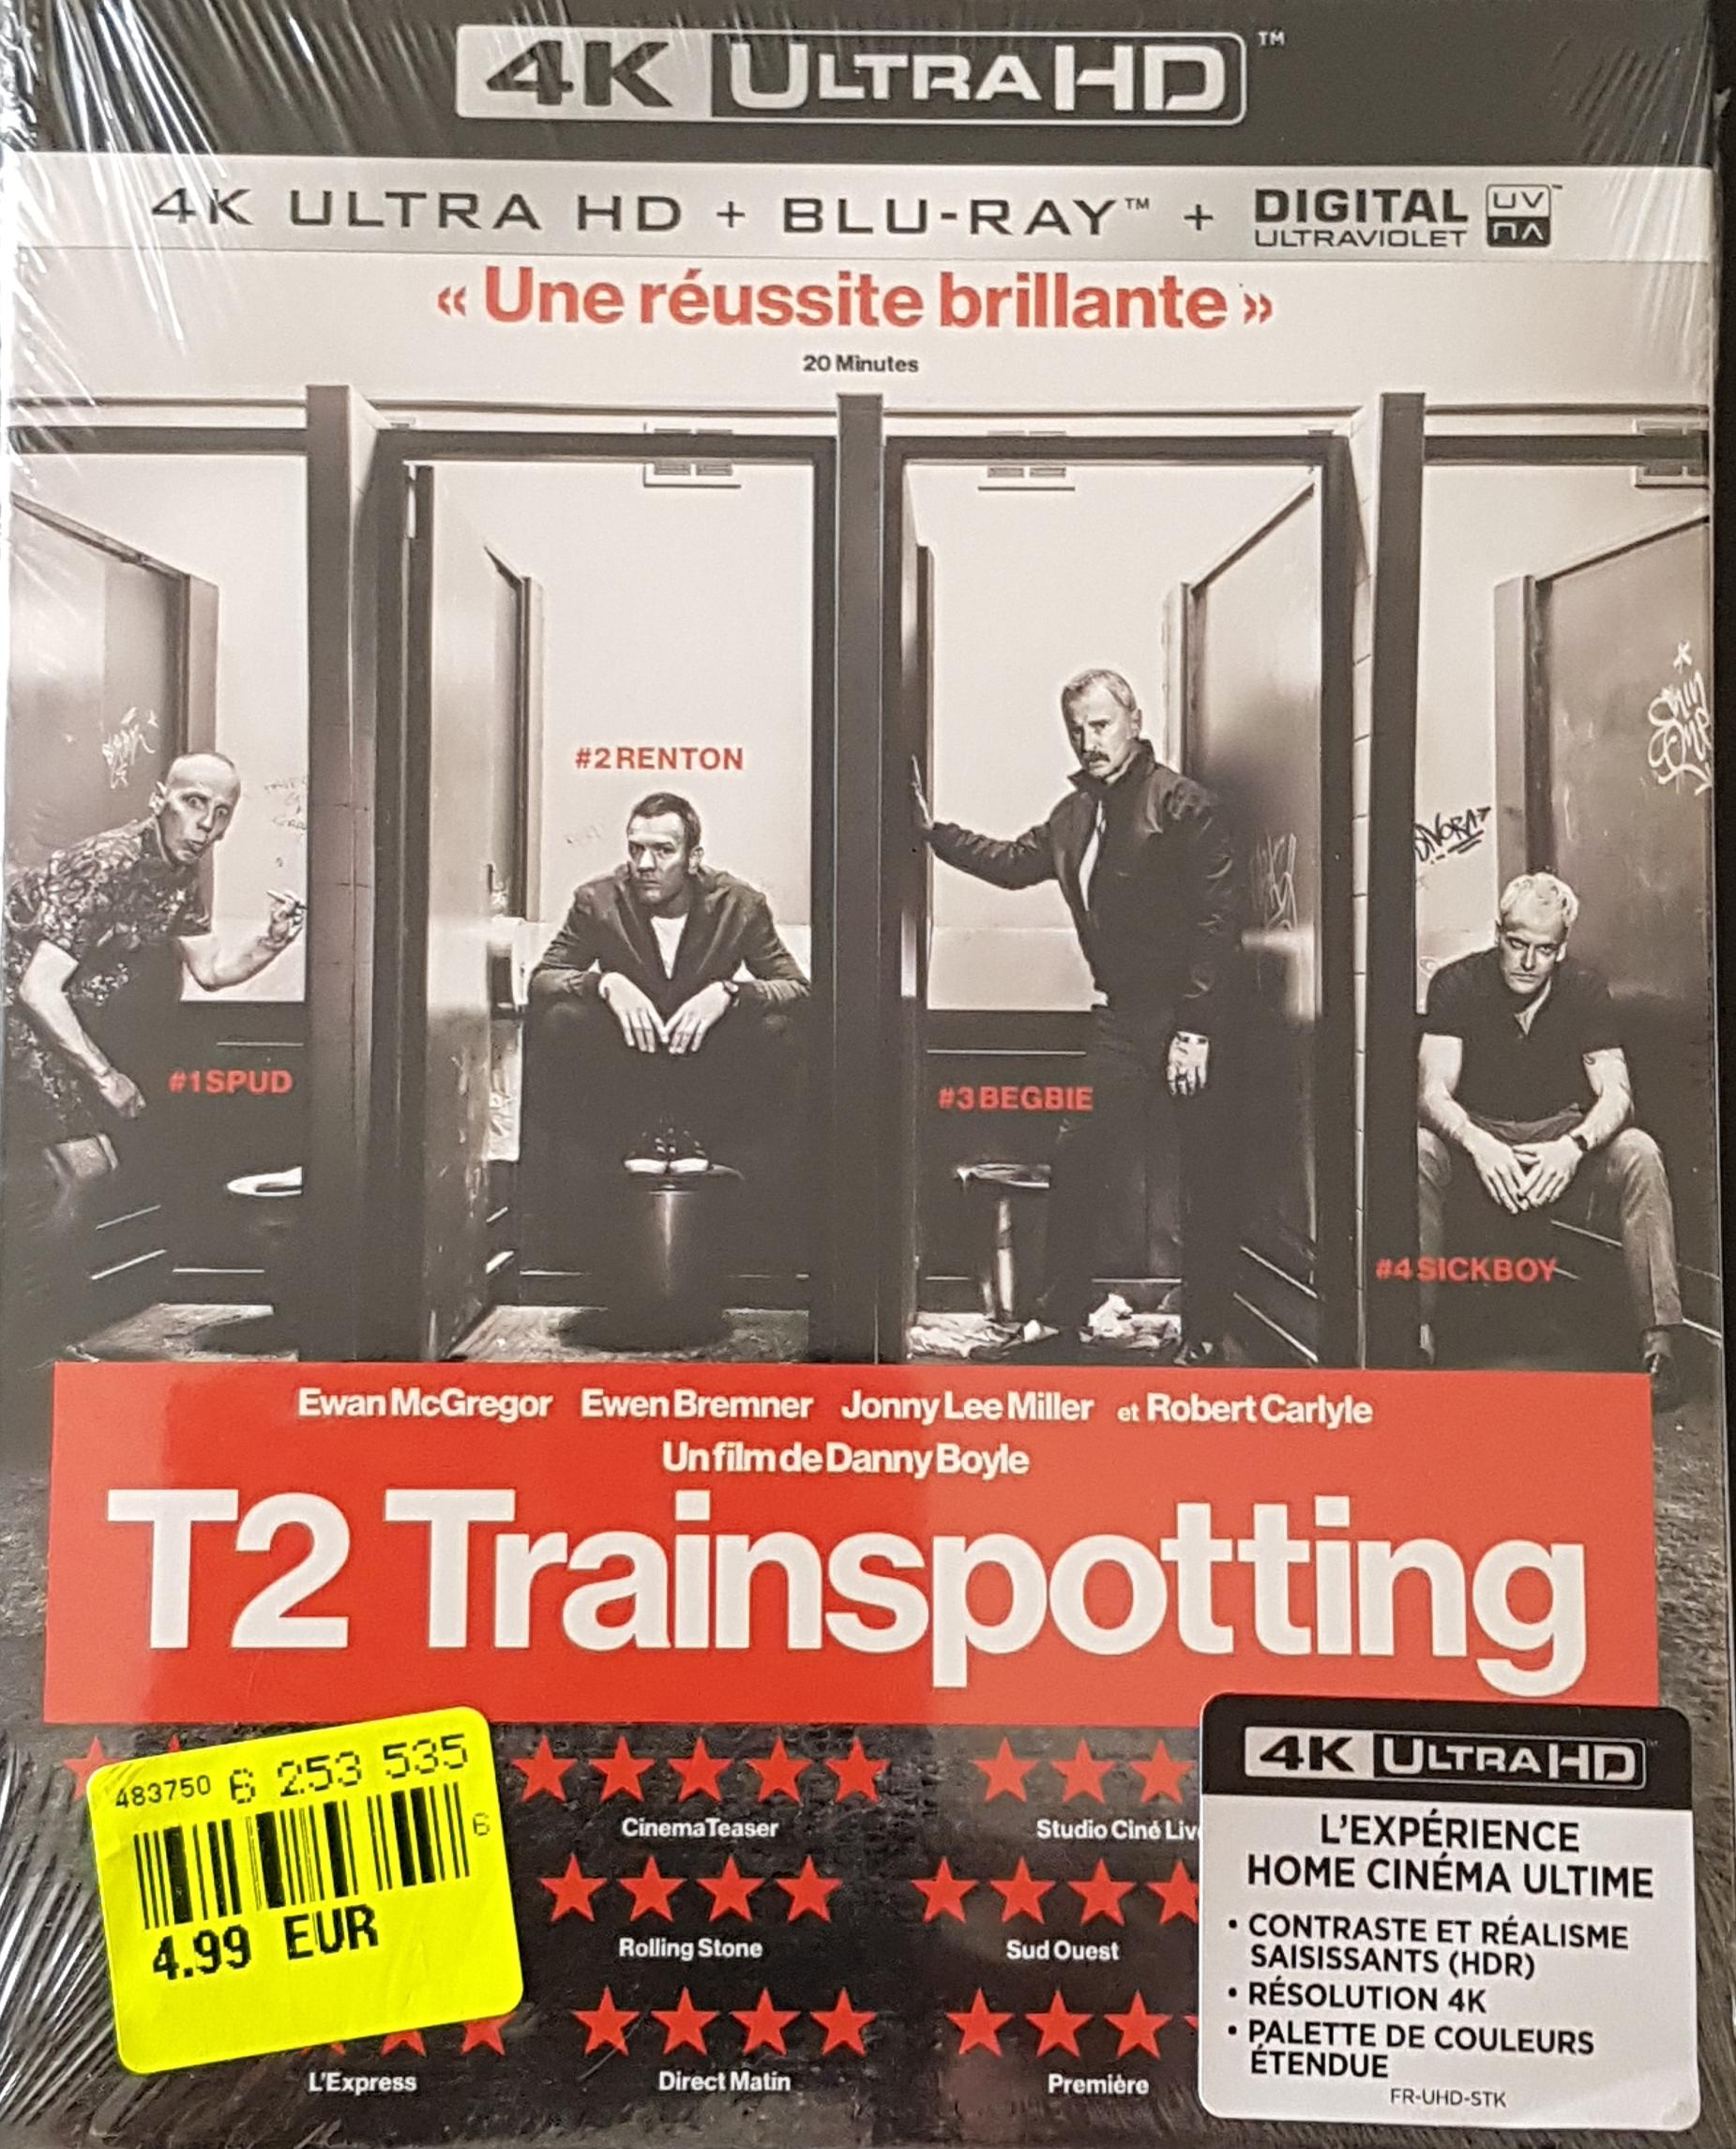 Sélection de Blu-ray en promotion - Ex : Blu-ray 4K UHD Trainspotting 2 - Clisson (44)